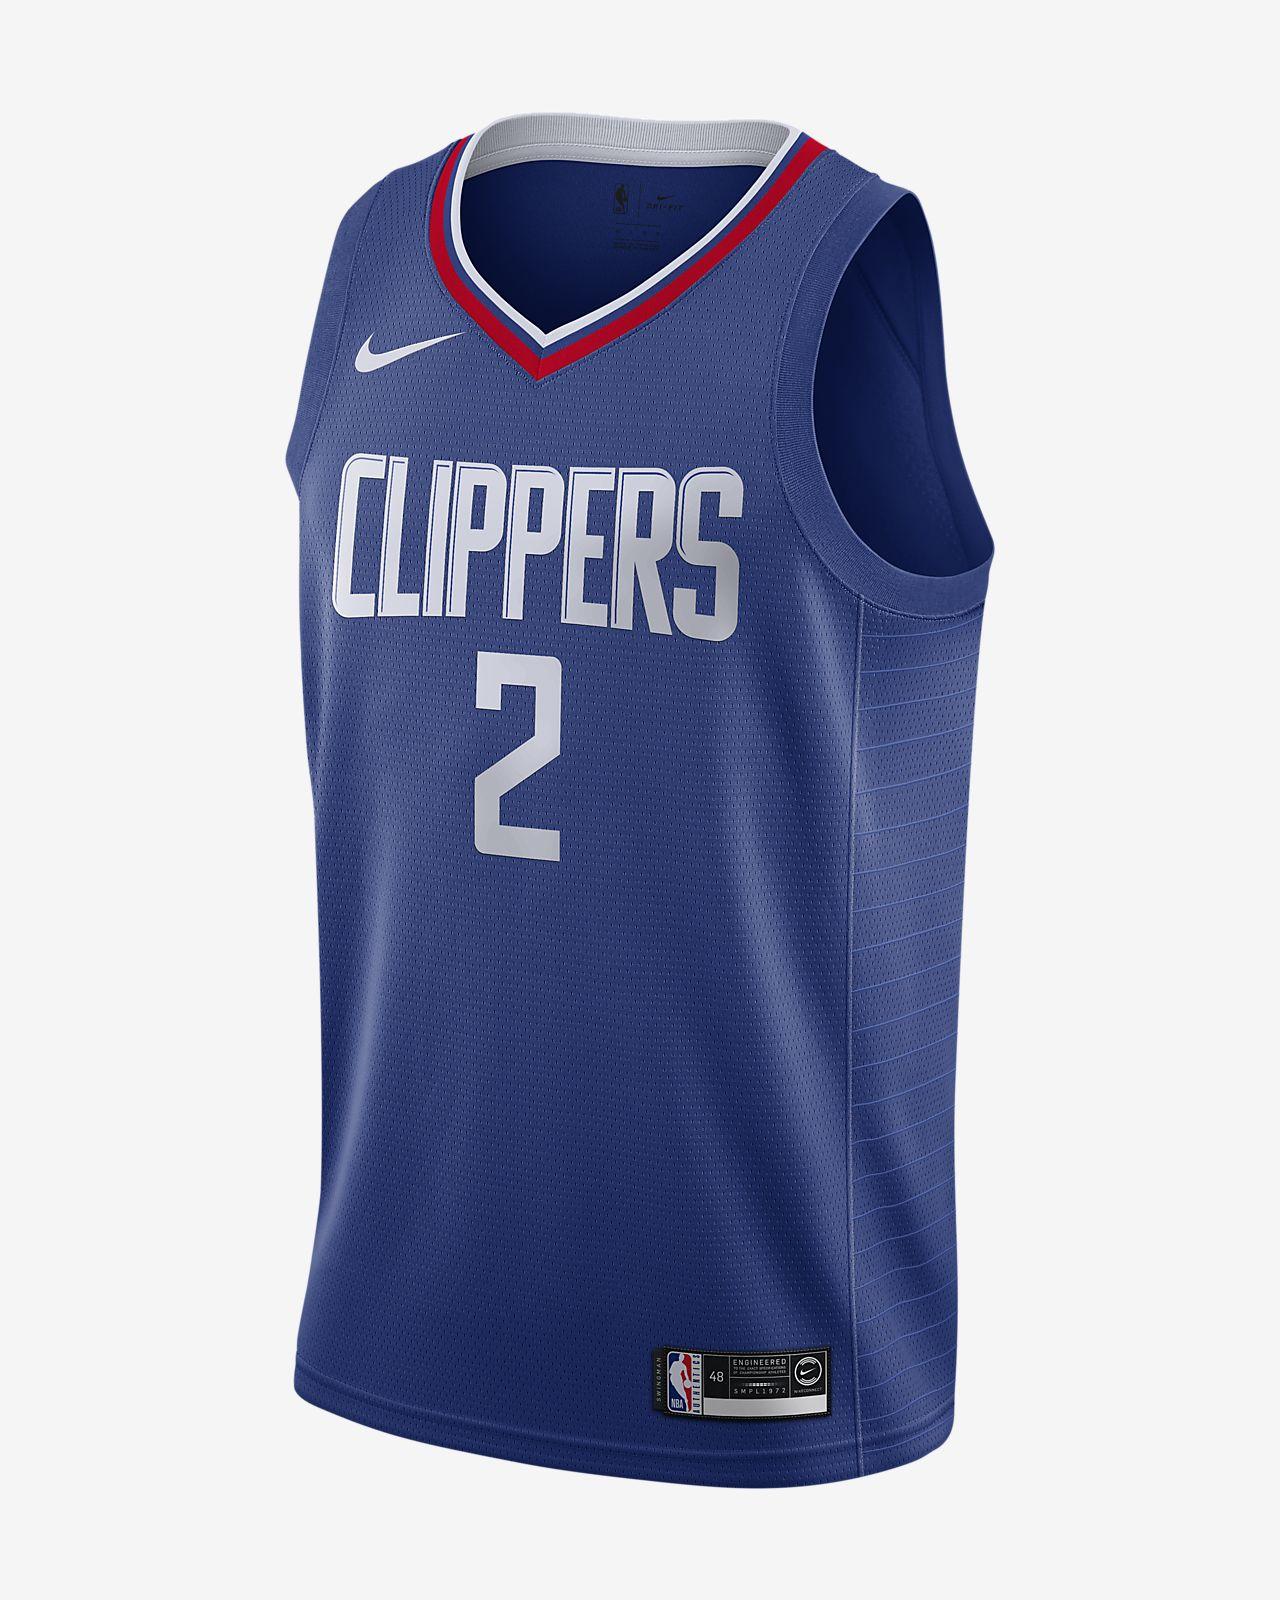 reputable site 59a01 4eea3 Kawhi Leonard Icon Edition Swingman (Los Angeles Clippers) Nike NBA  Connected Jersey